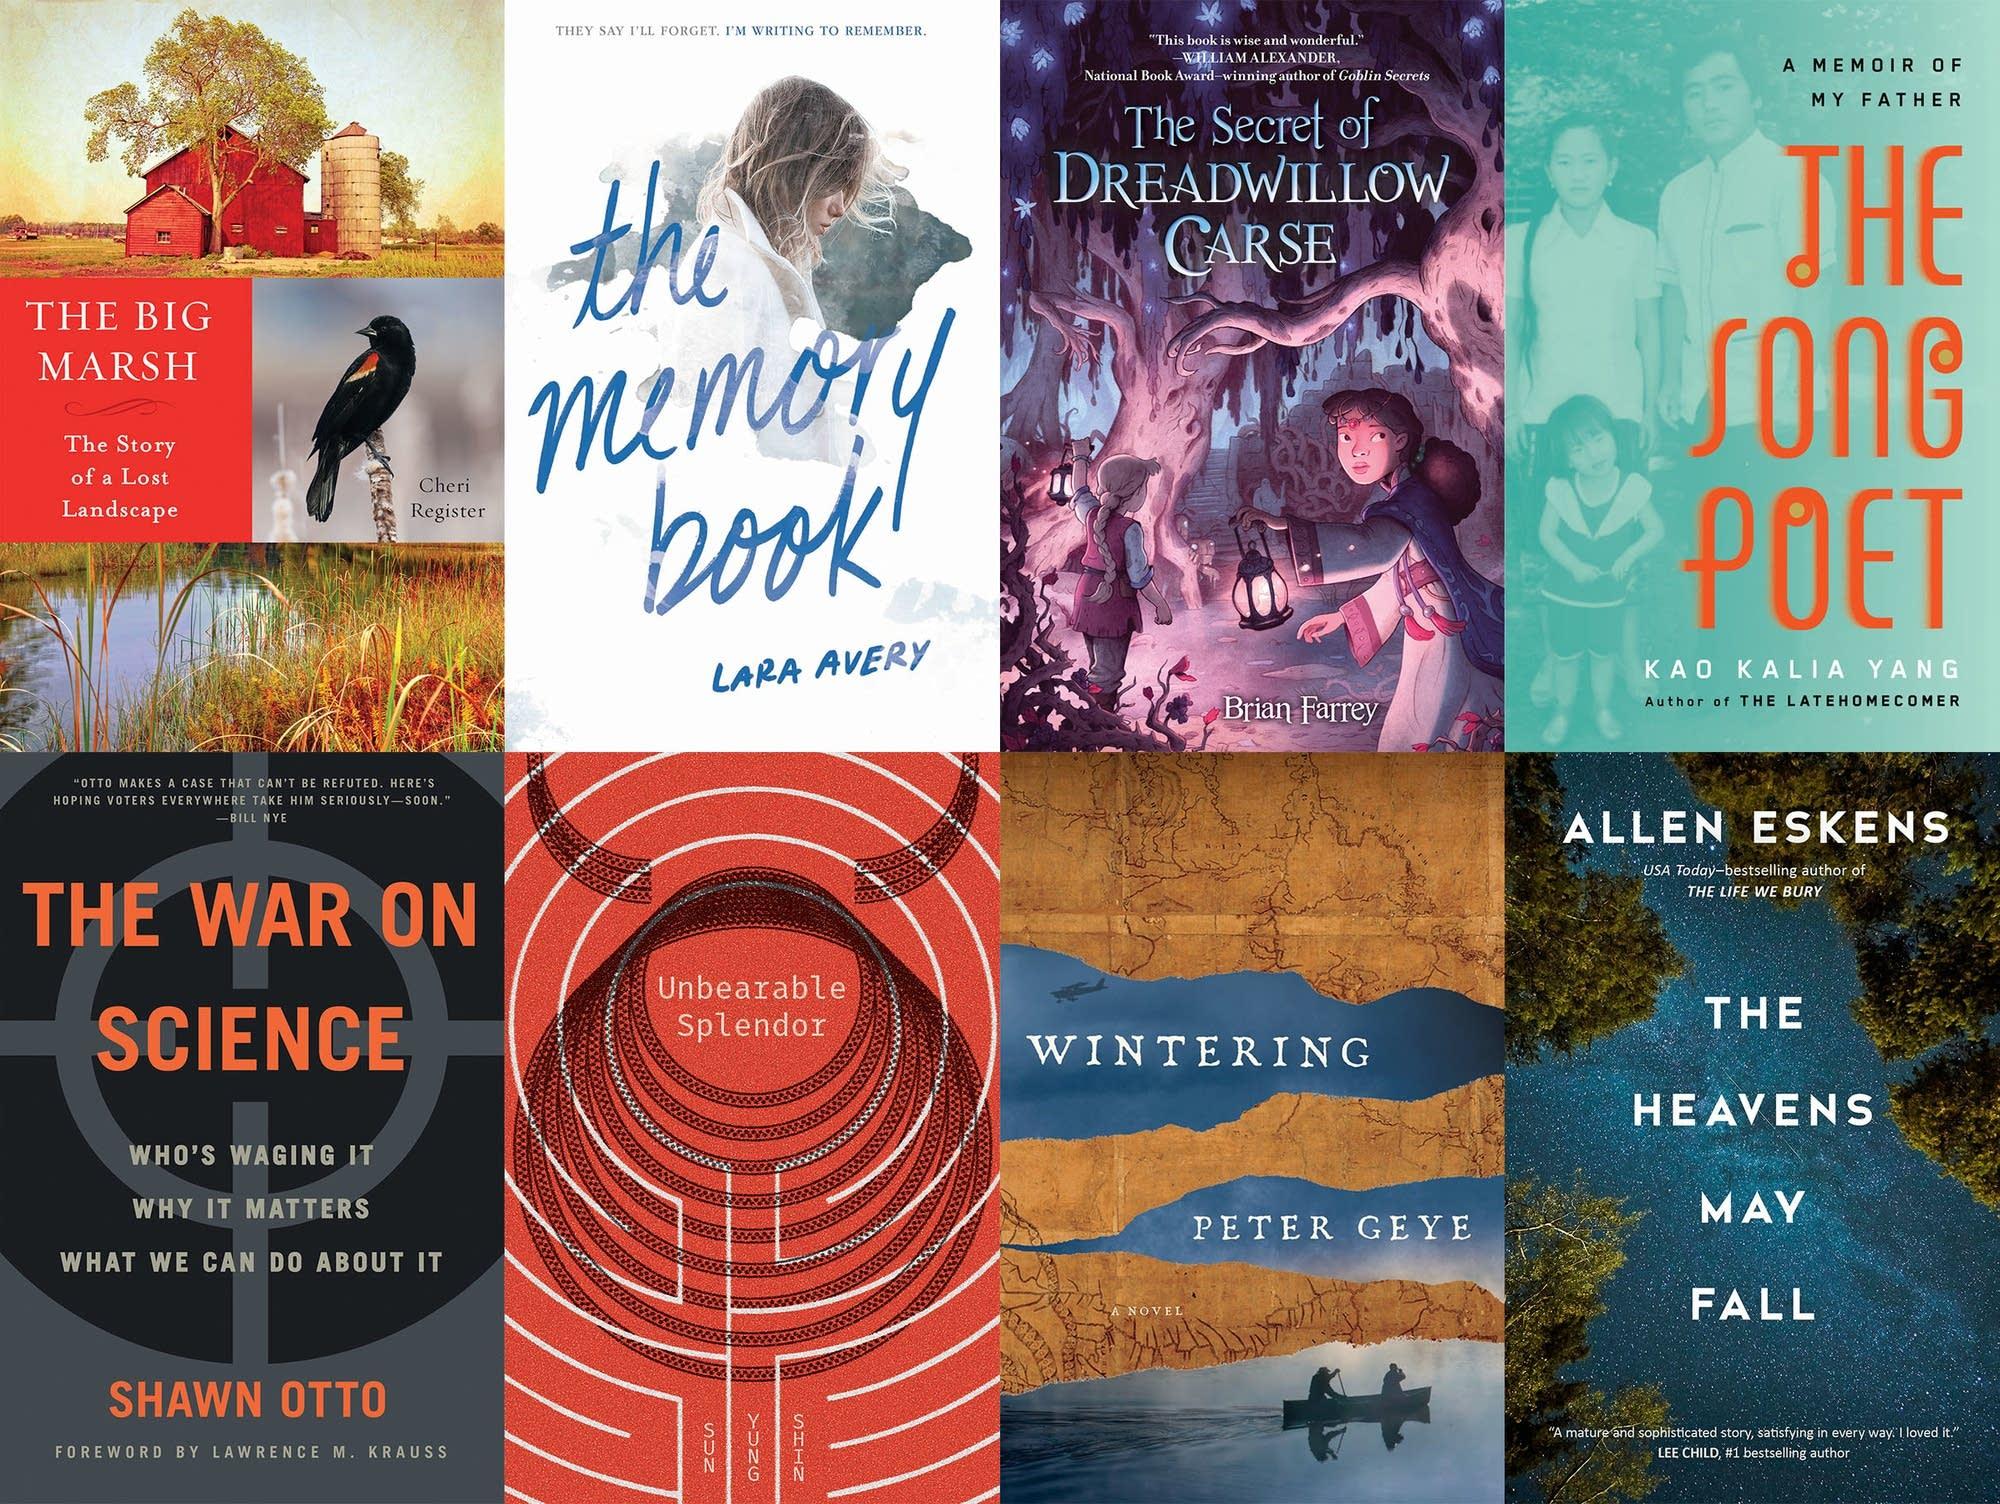 c57835478a79 2017 Minnesota Book Award winners announced